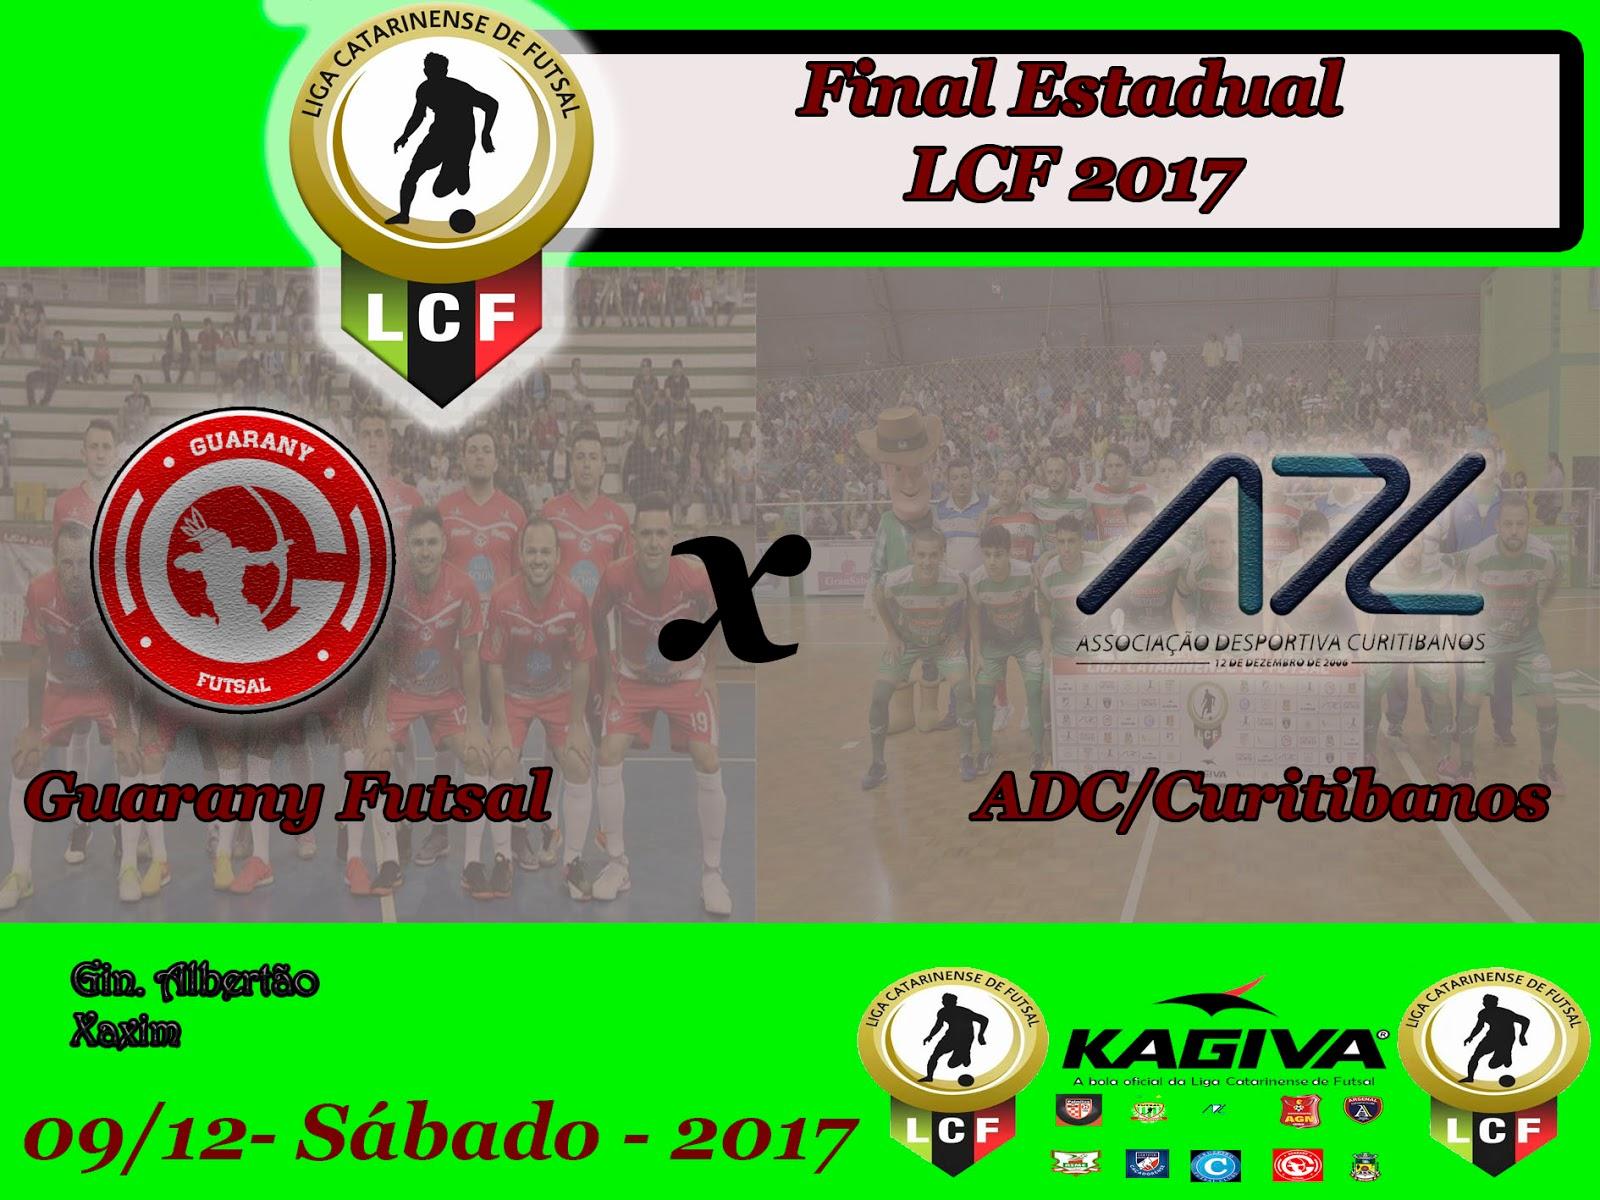 ADC Curitibanos e Guarany de Xaxim decidem a LCF 2017 184f4e791d2e4